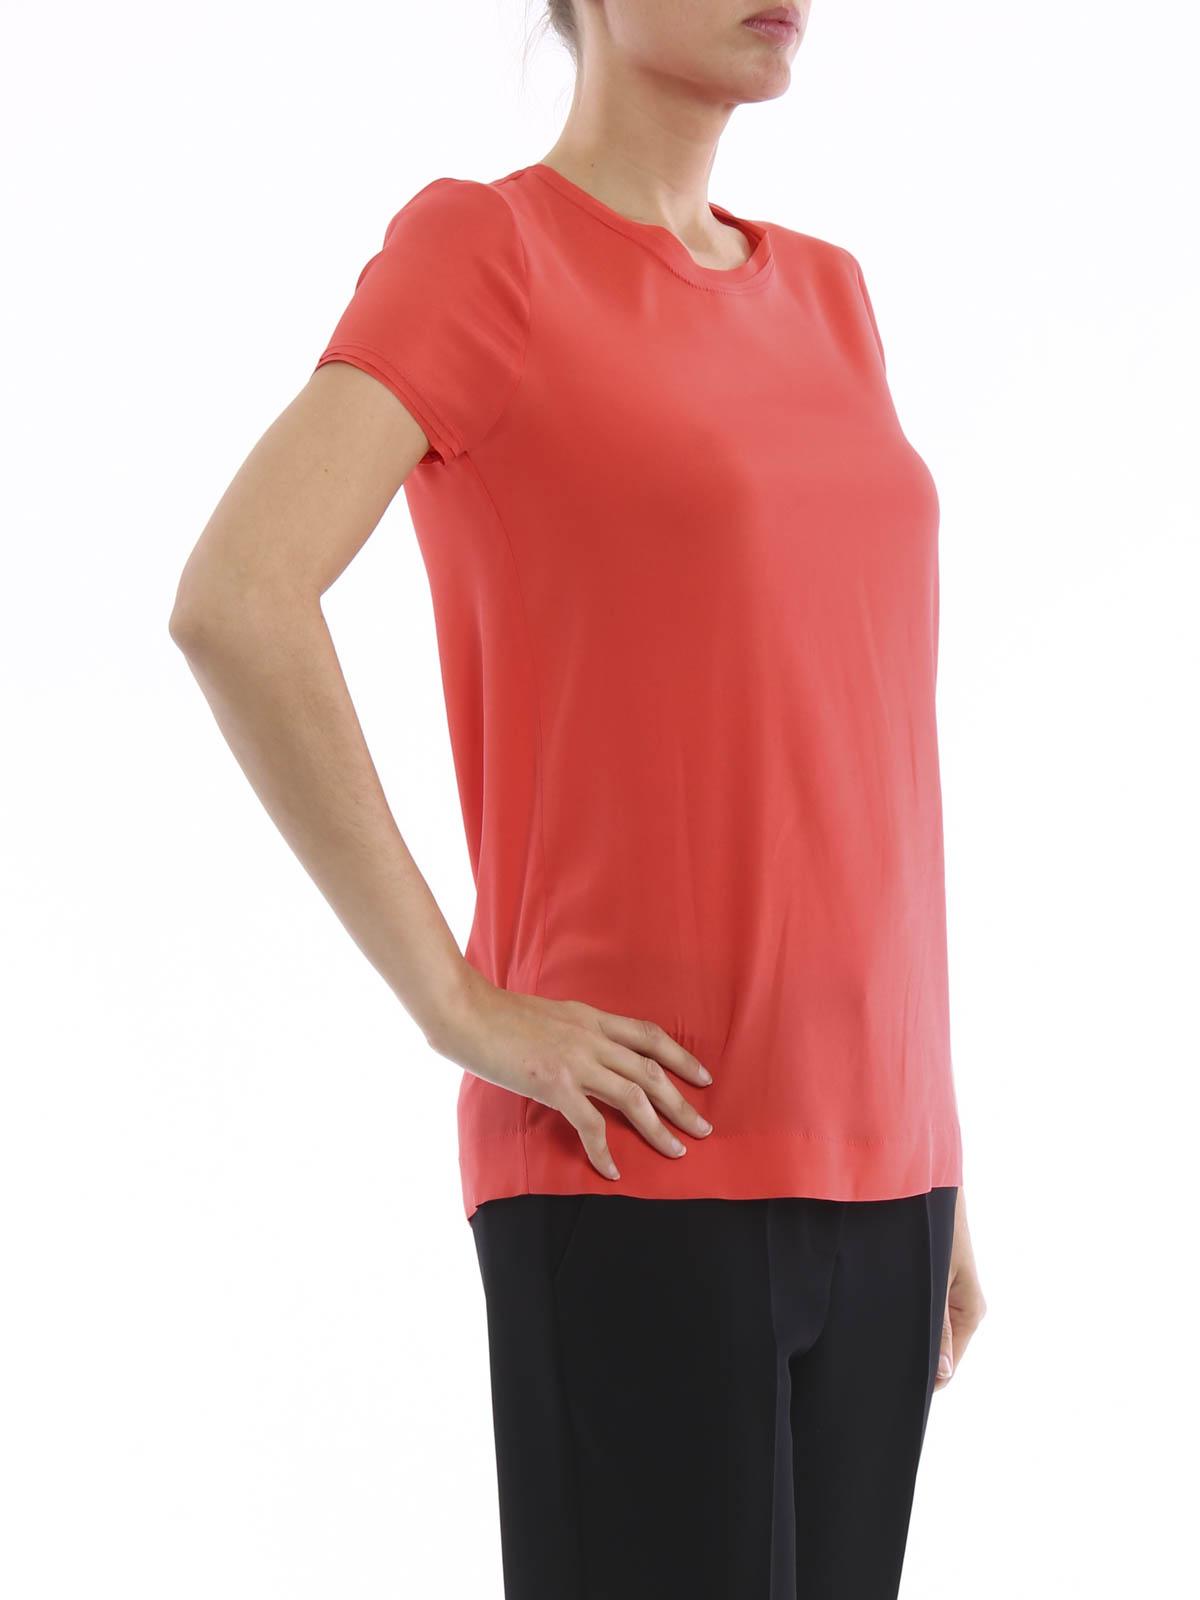 Silk T Shirt By Paolo Fiorillo Capri T Shirts Shop